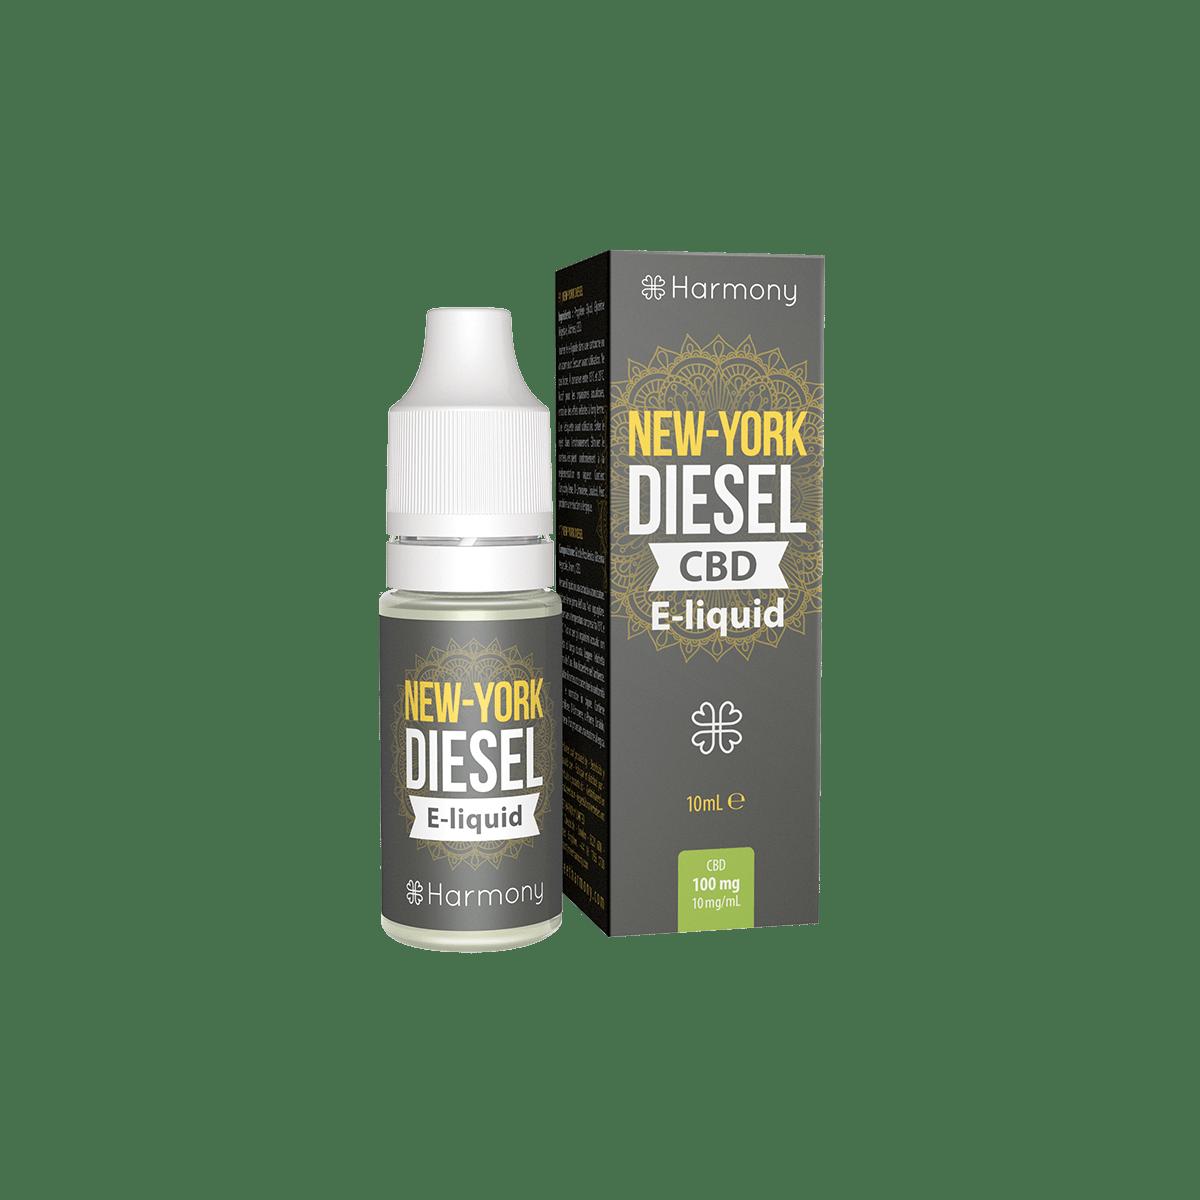 CBD Liquid | HARMONY New York Diesel | Menge 10 ml - 30 mg